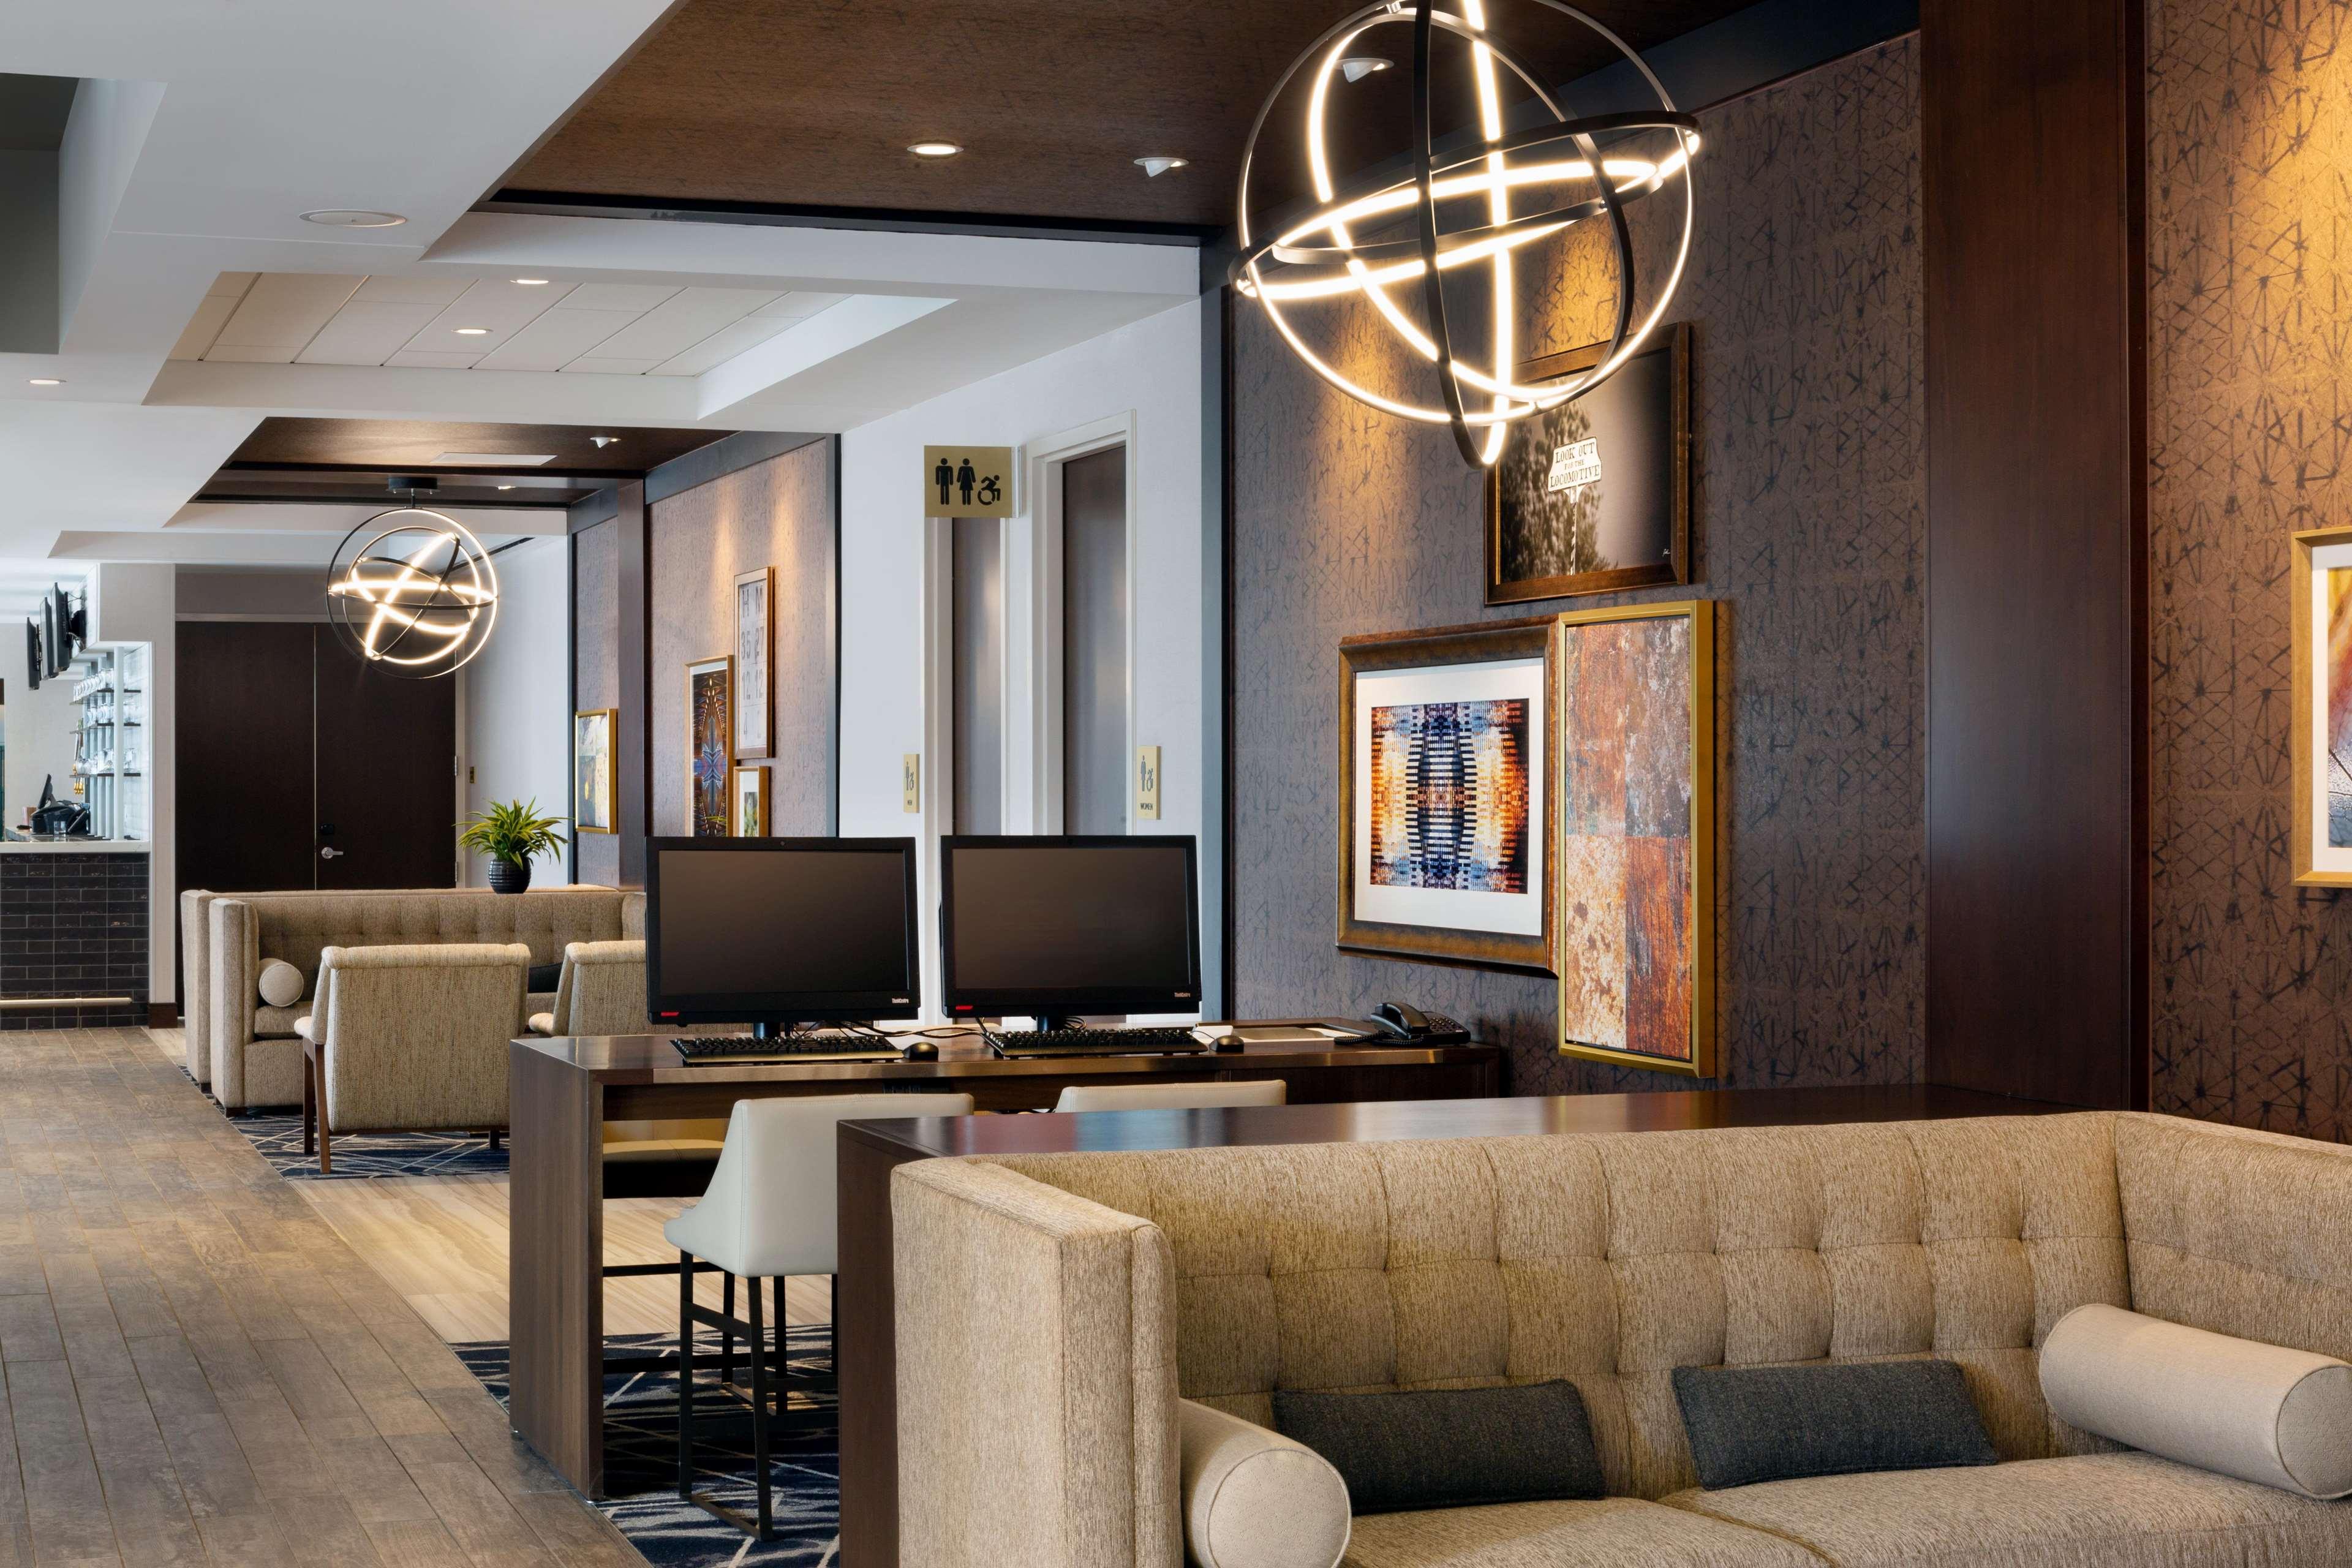 DoubleTree by Hilton Jamestown image 4